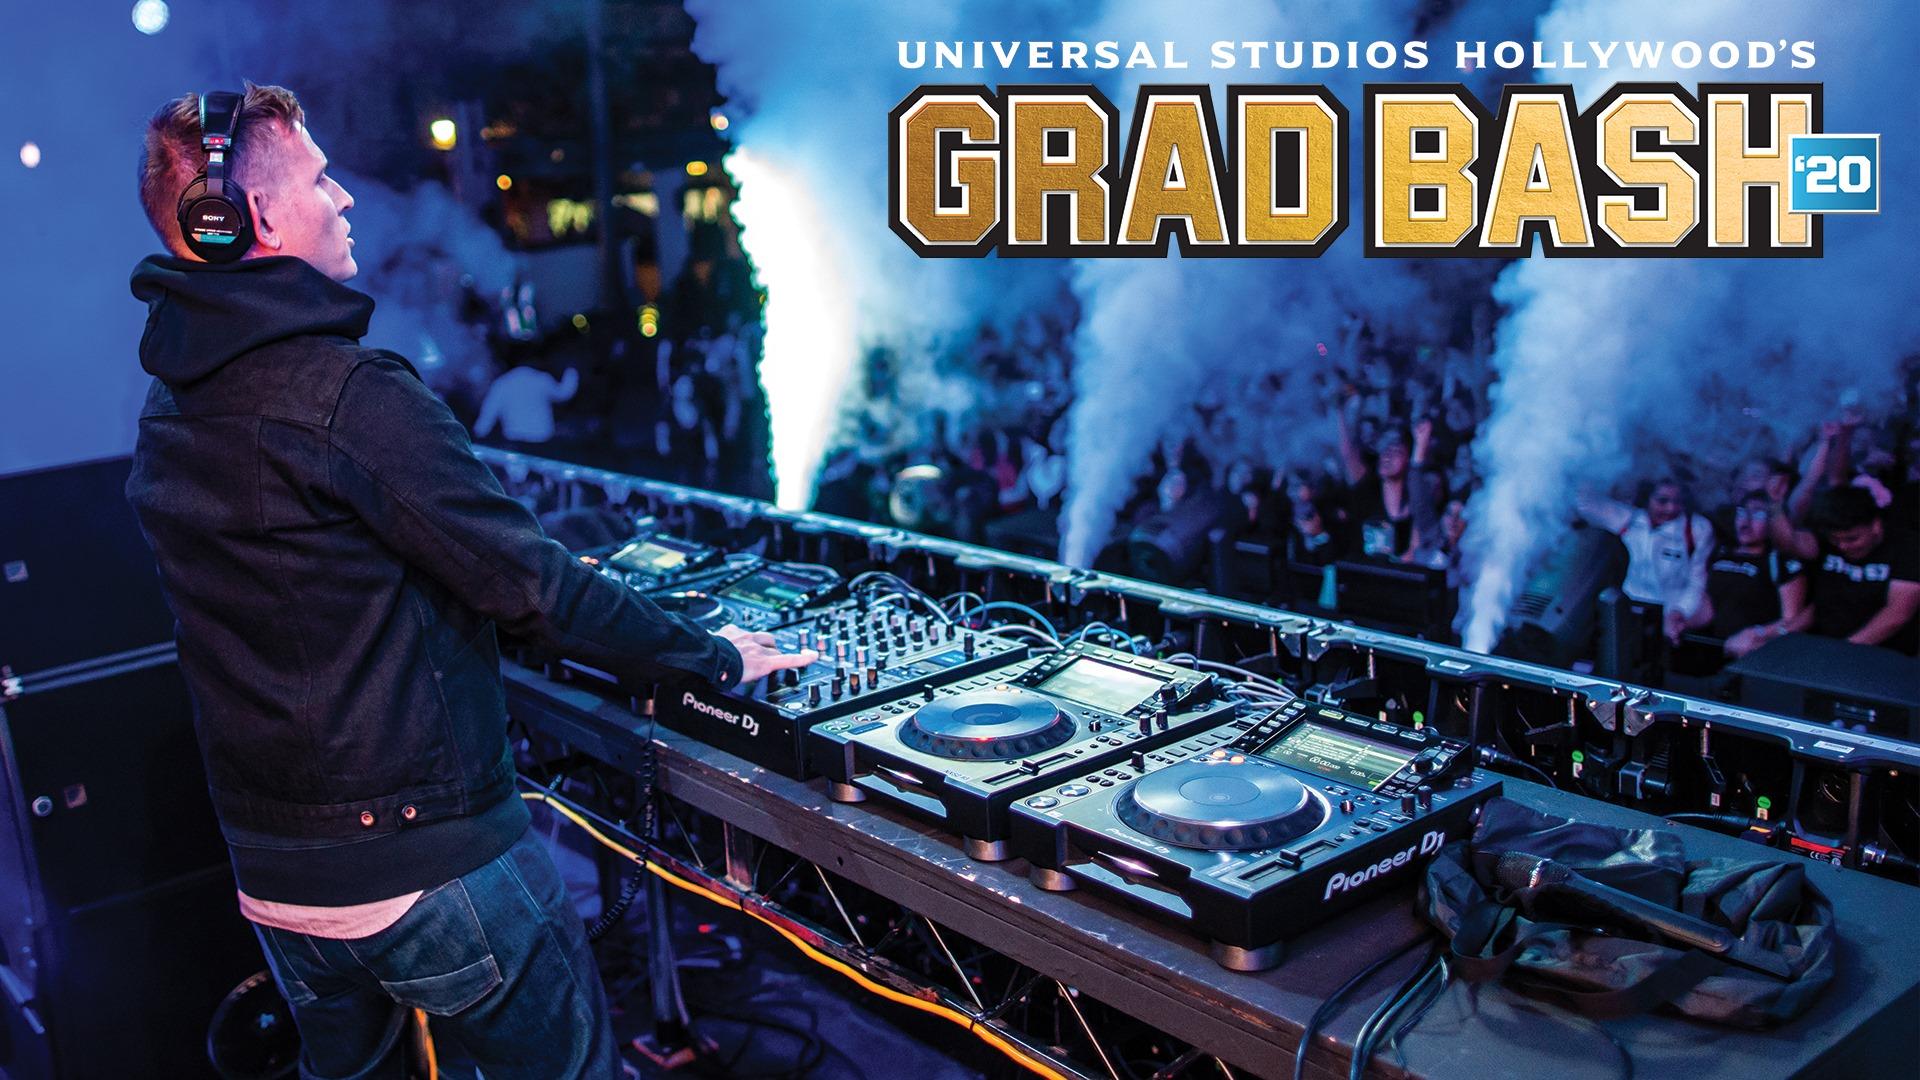 Grad Bash 2020 Universal Studios Hollywood